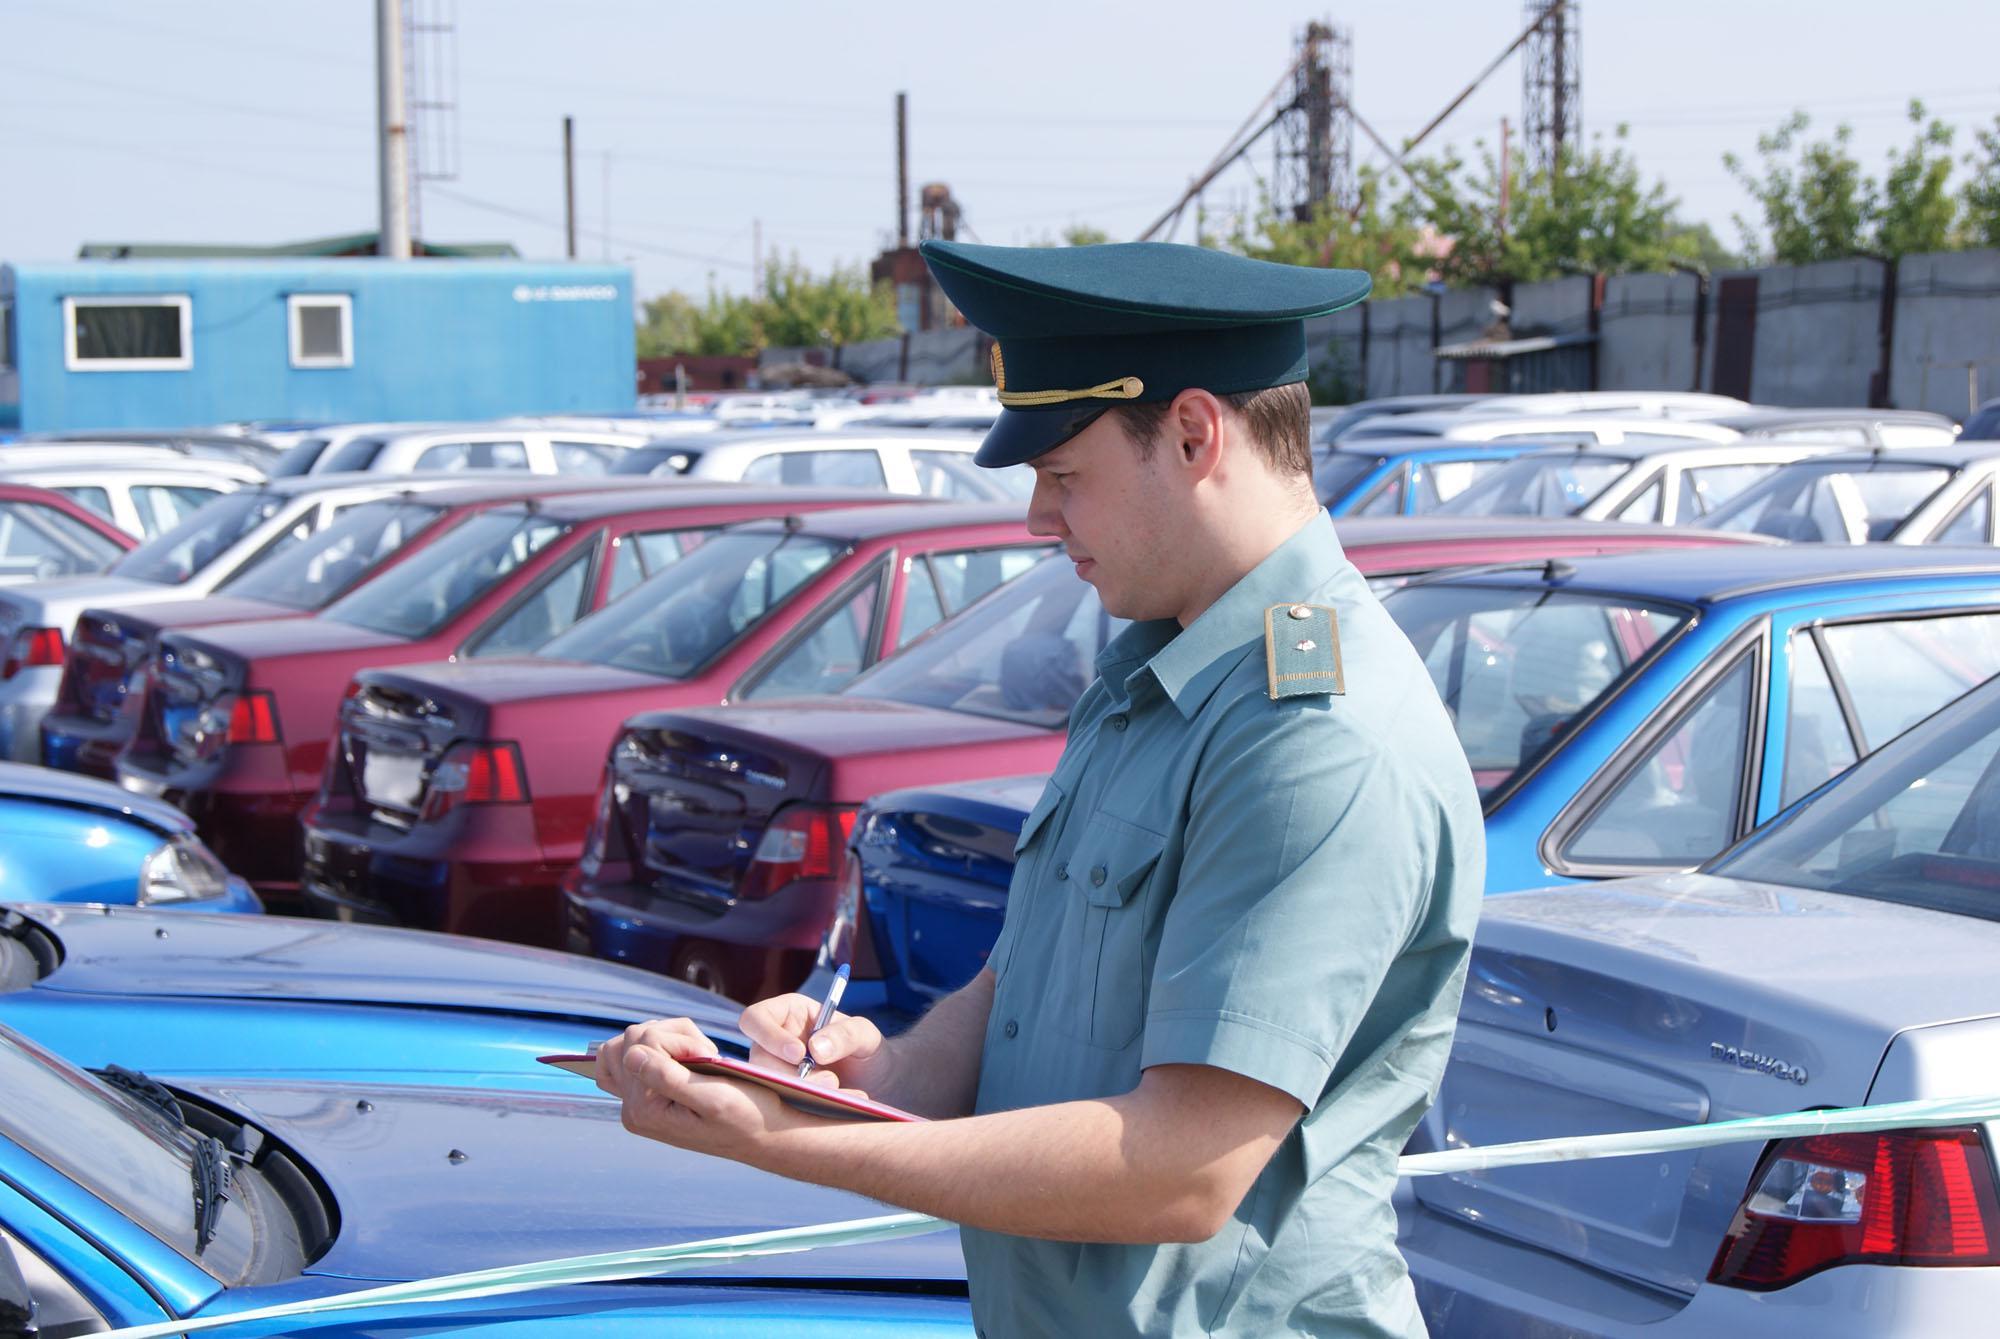 Мурманская таможня: авто арестован, владелец ждет наказания - Кримимнал - TKS.RU